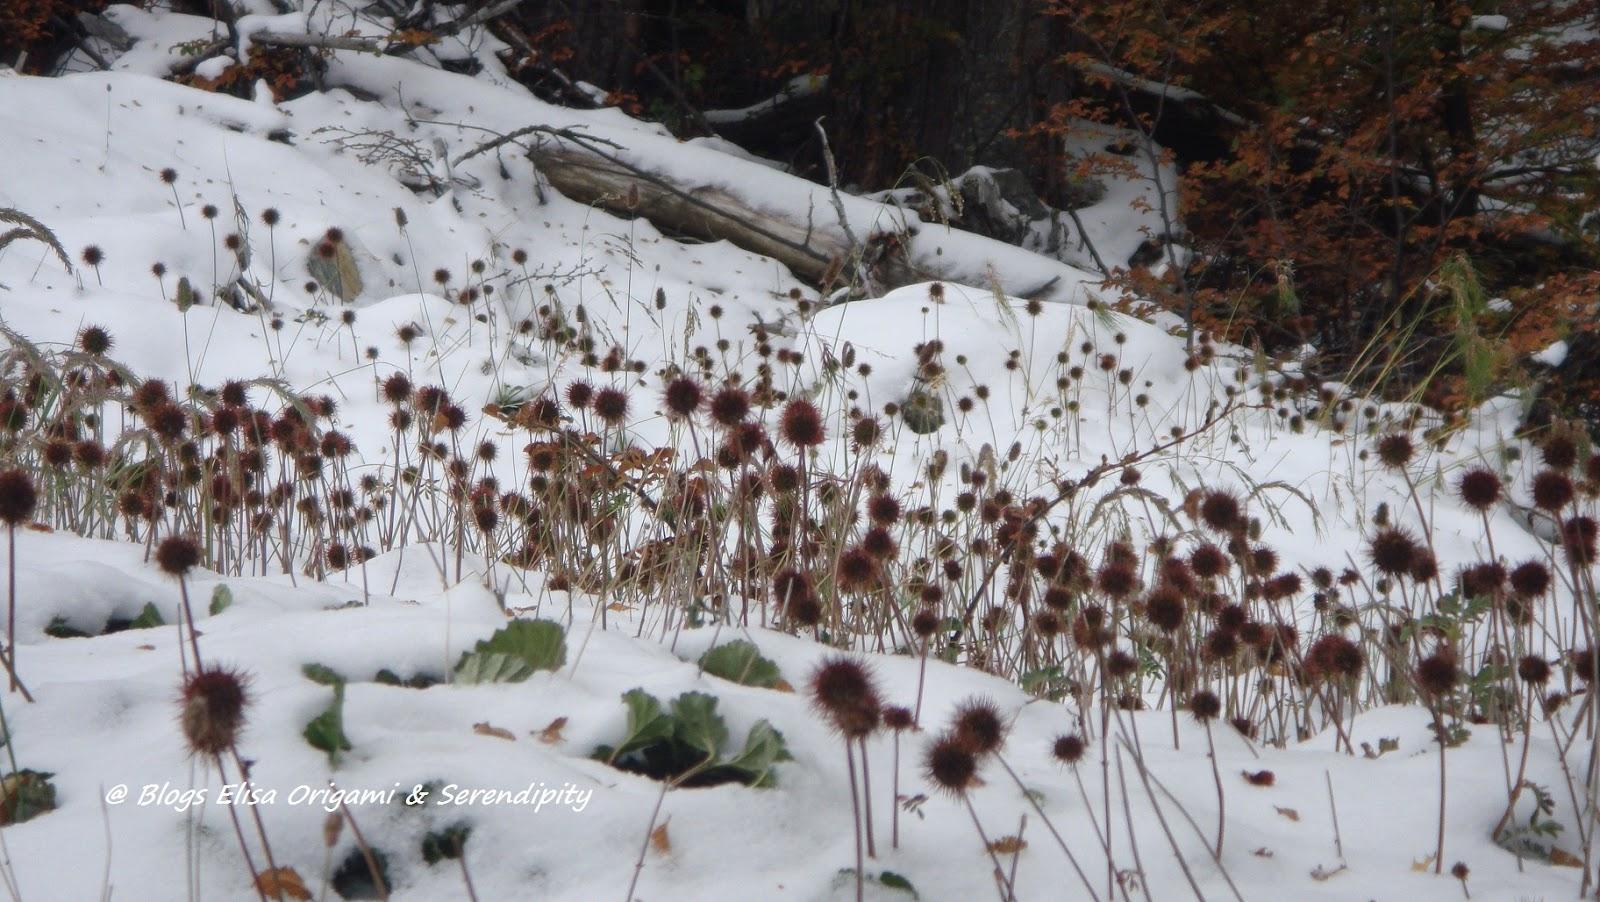 Glaciar Martial, Ushuaia, Patagonia, Argentina, Elisa N, Blog de Viajes, Lifestyle, Travel